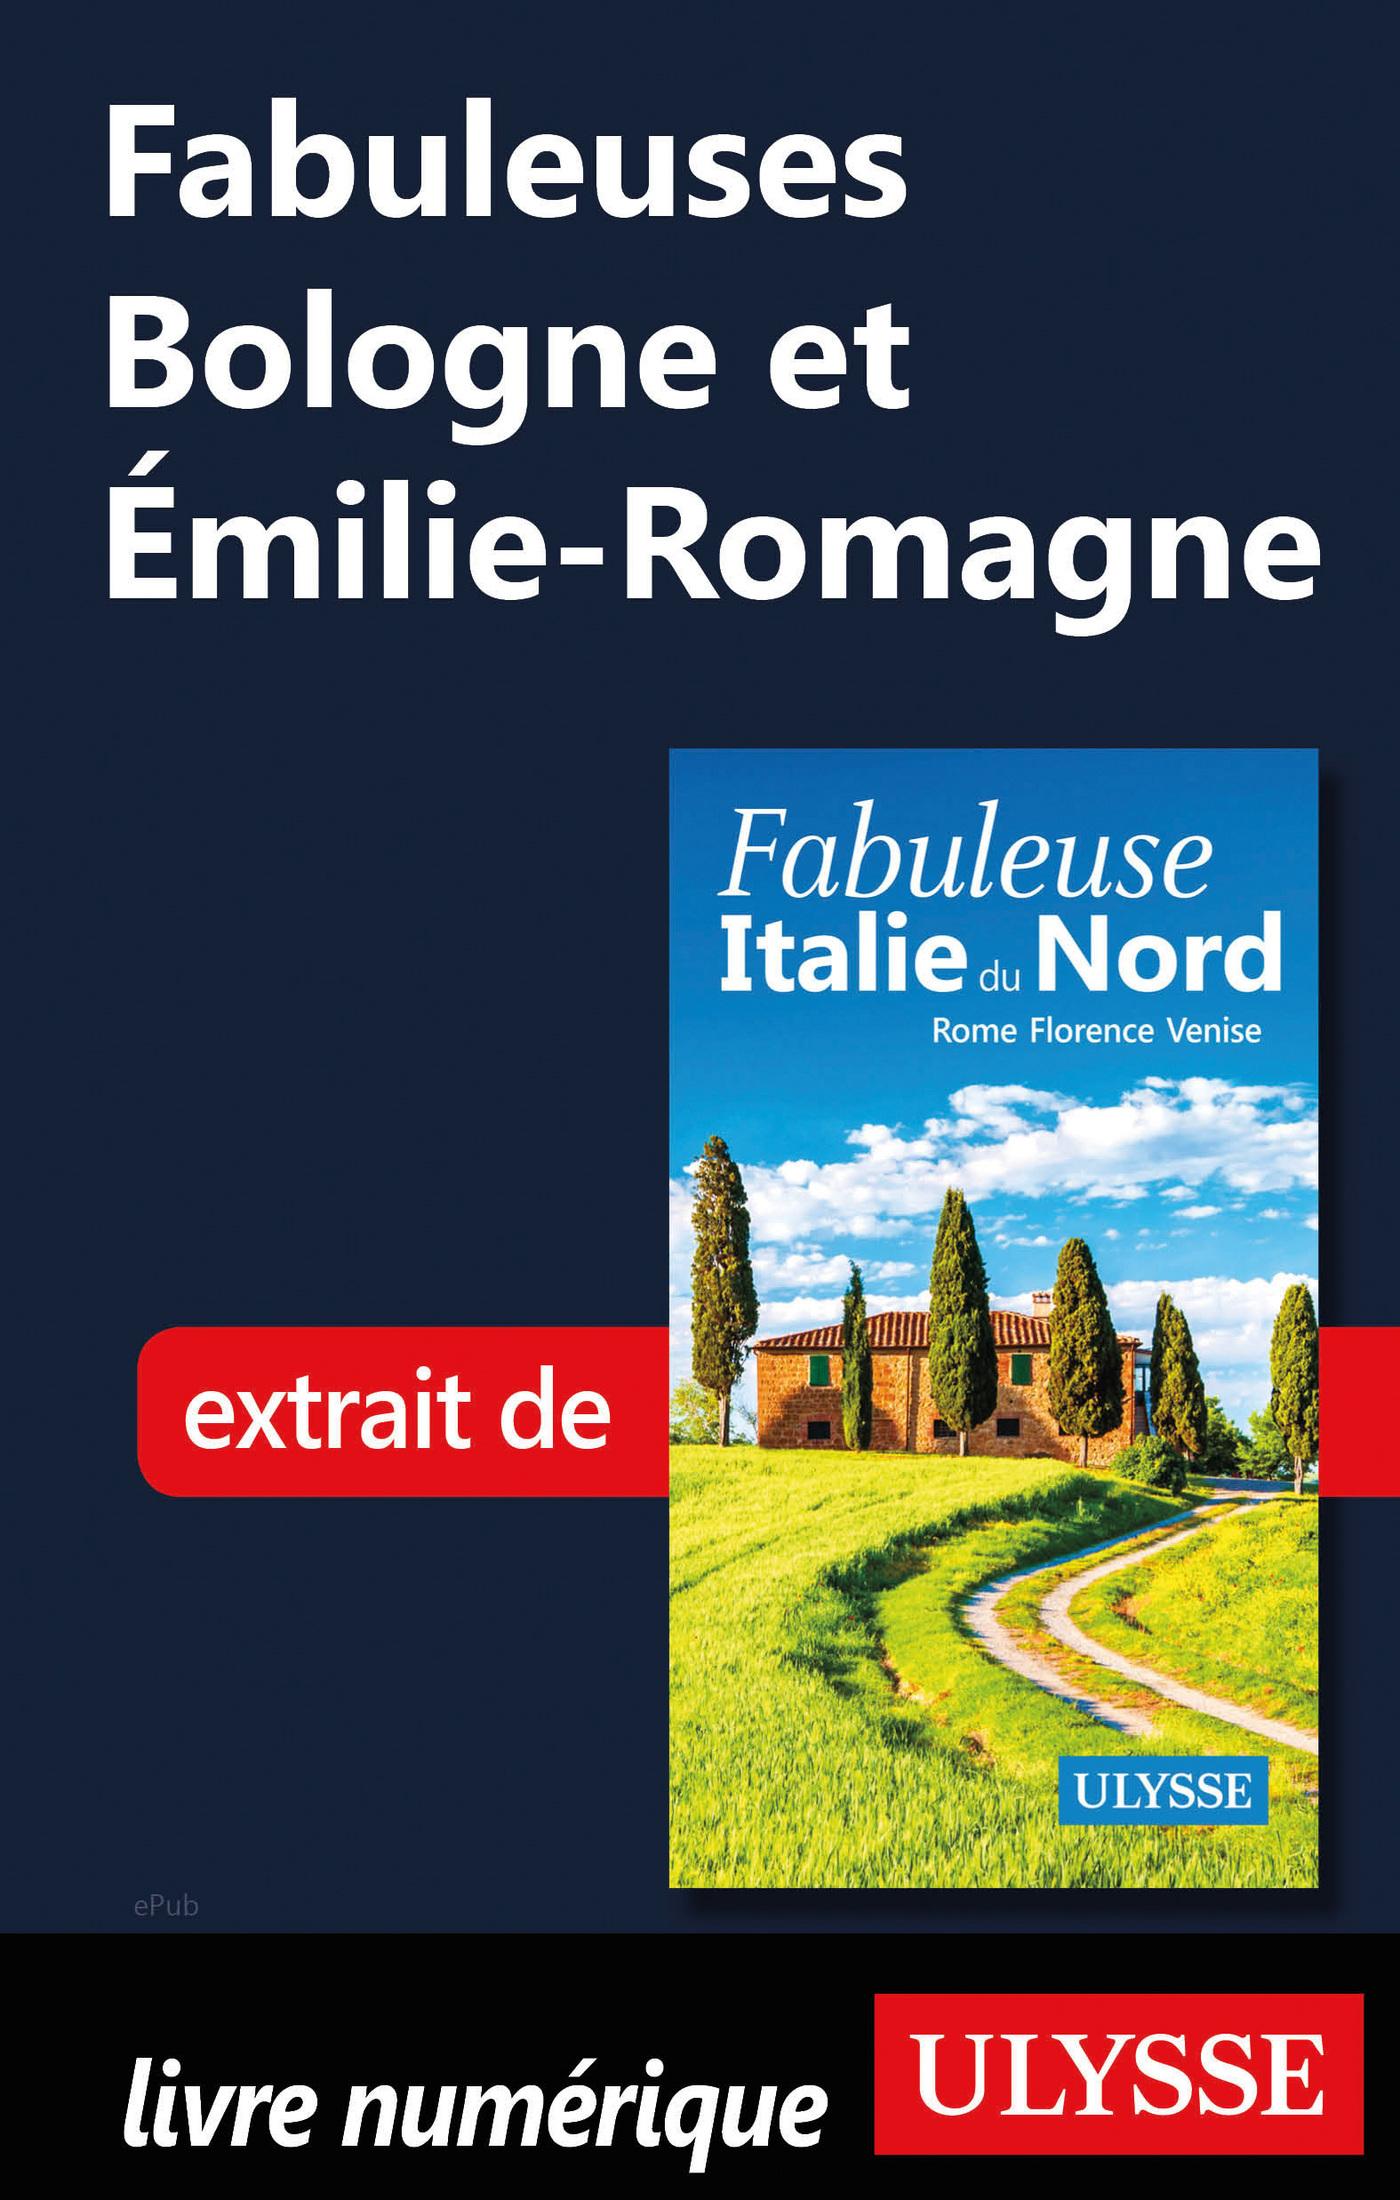 Fabuleuses Bologne et Emilie-Romagne (Italie du Nord)